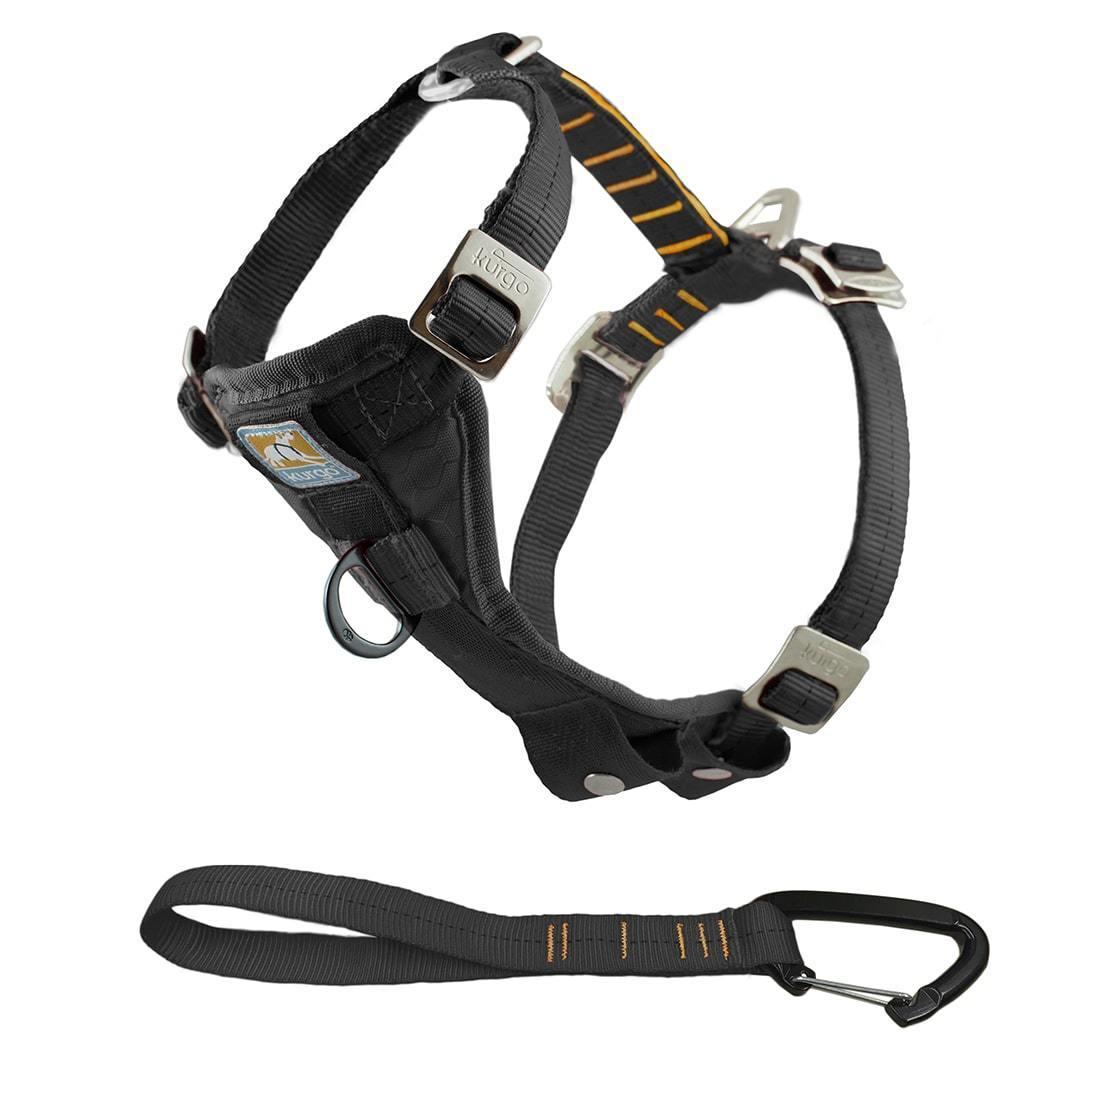 kg-dog-car-safety-harness-2.jpg